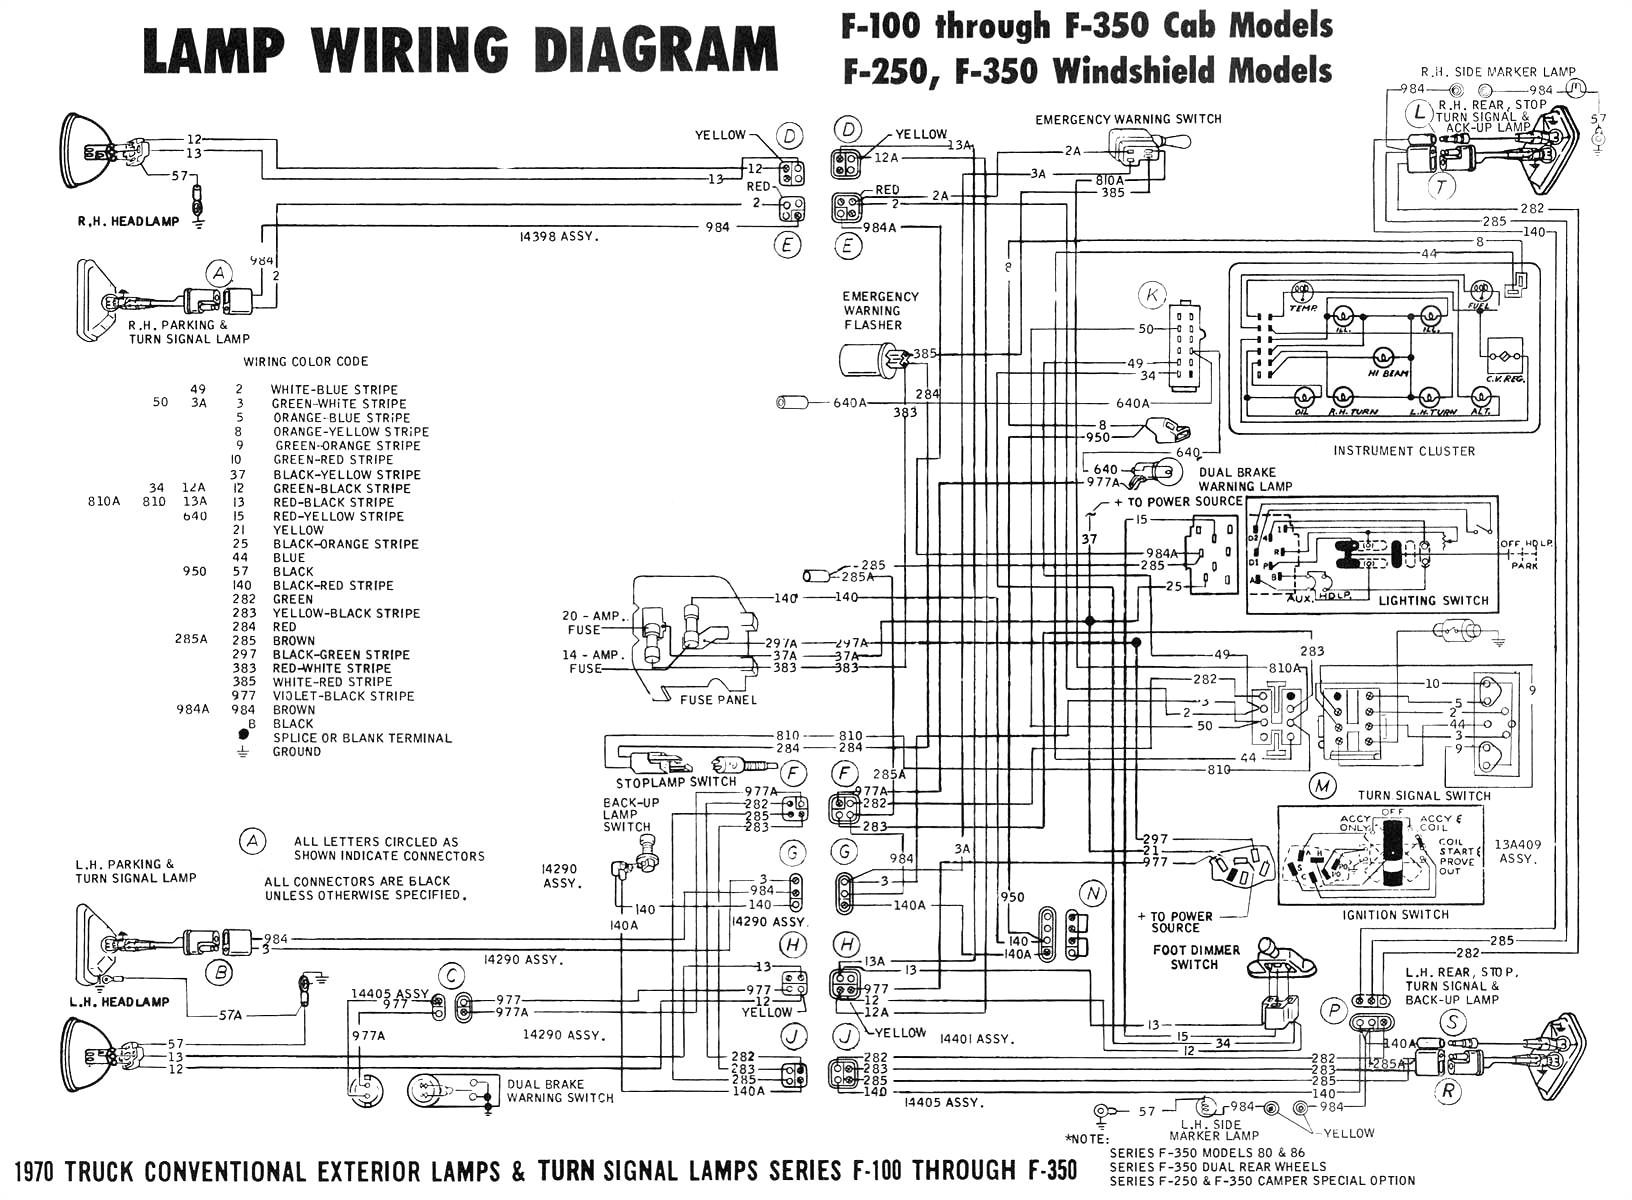 2001 Saturn L200 Radio Wiring Diagram Wiring Diagram for Mitsubishi L200 Wiring Diagram Home